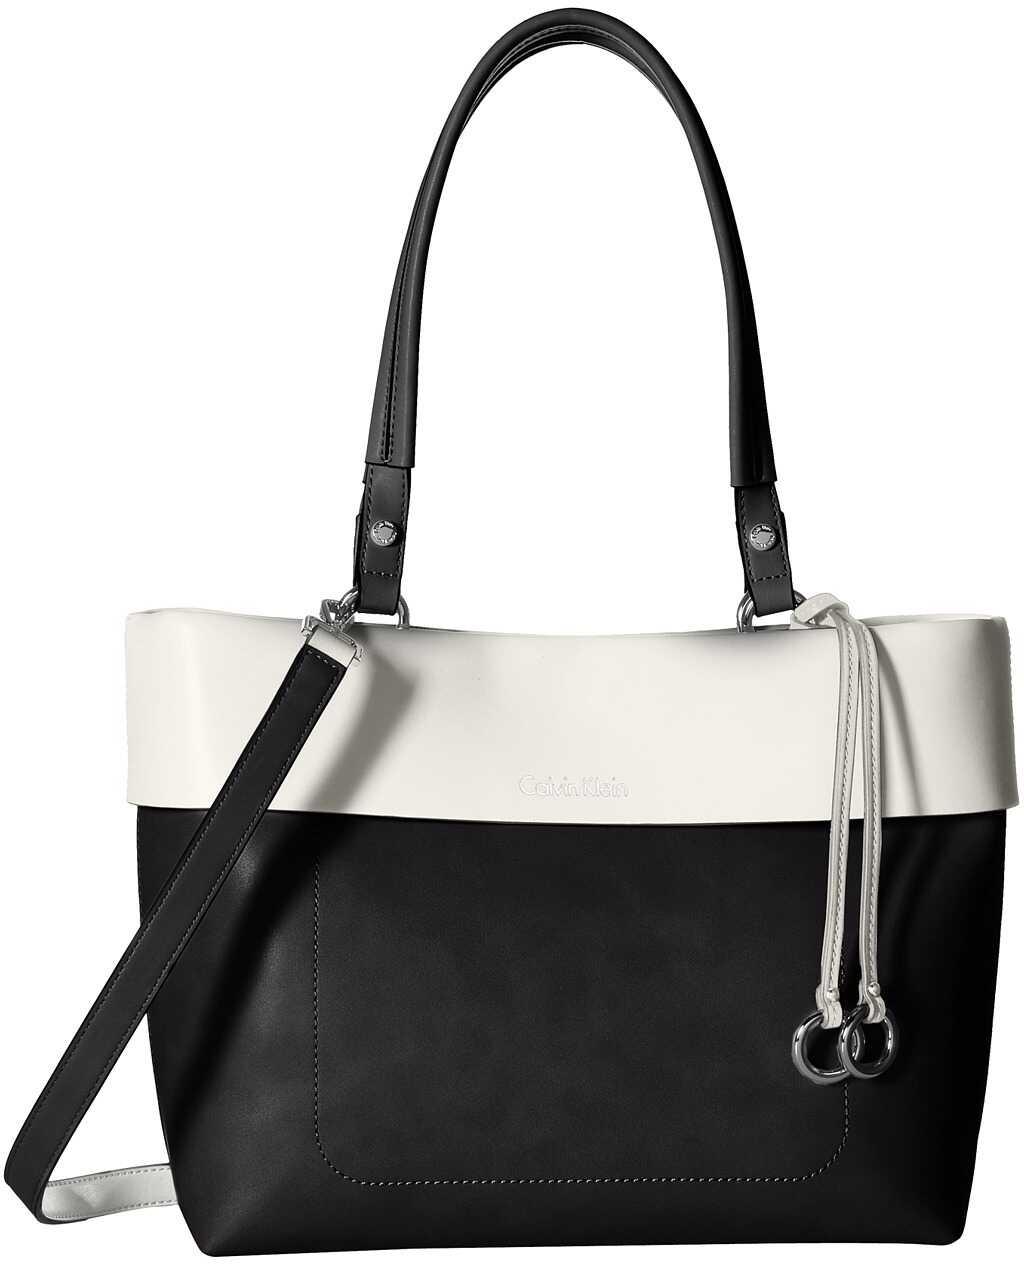 Calvin Klein East/West Tote Black/White